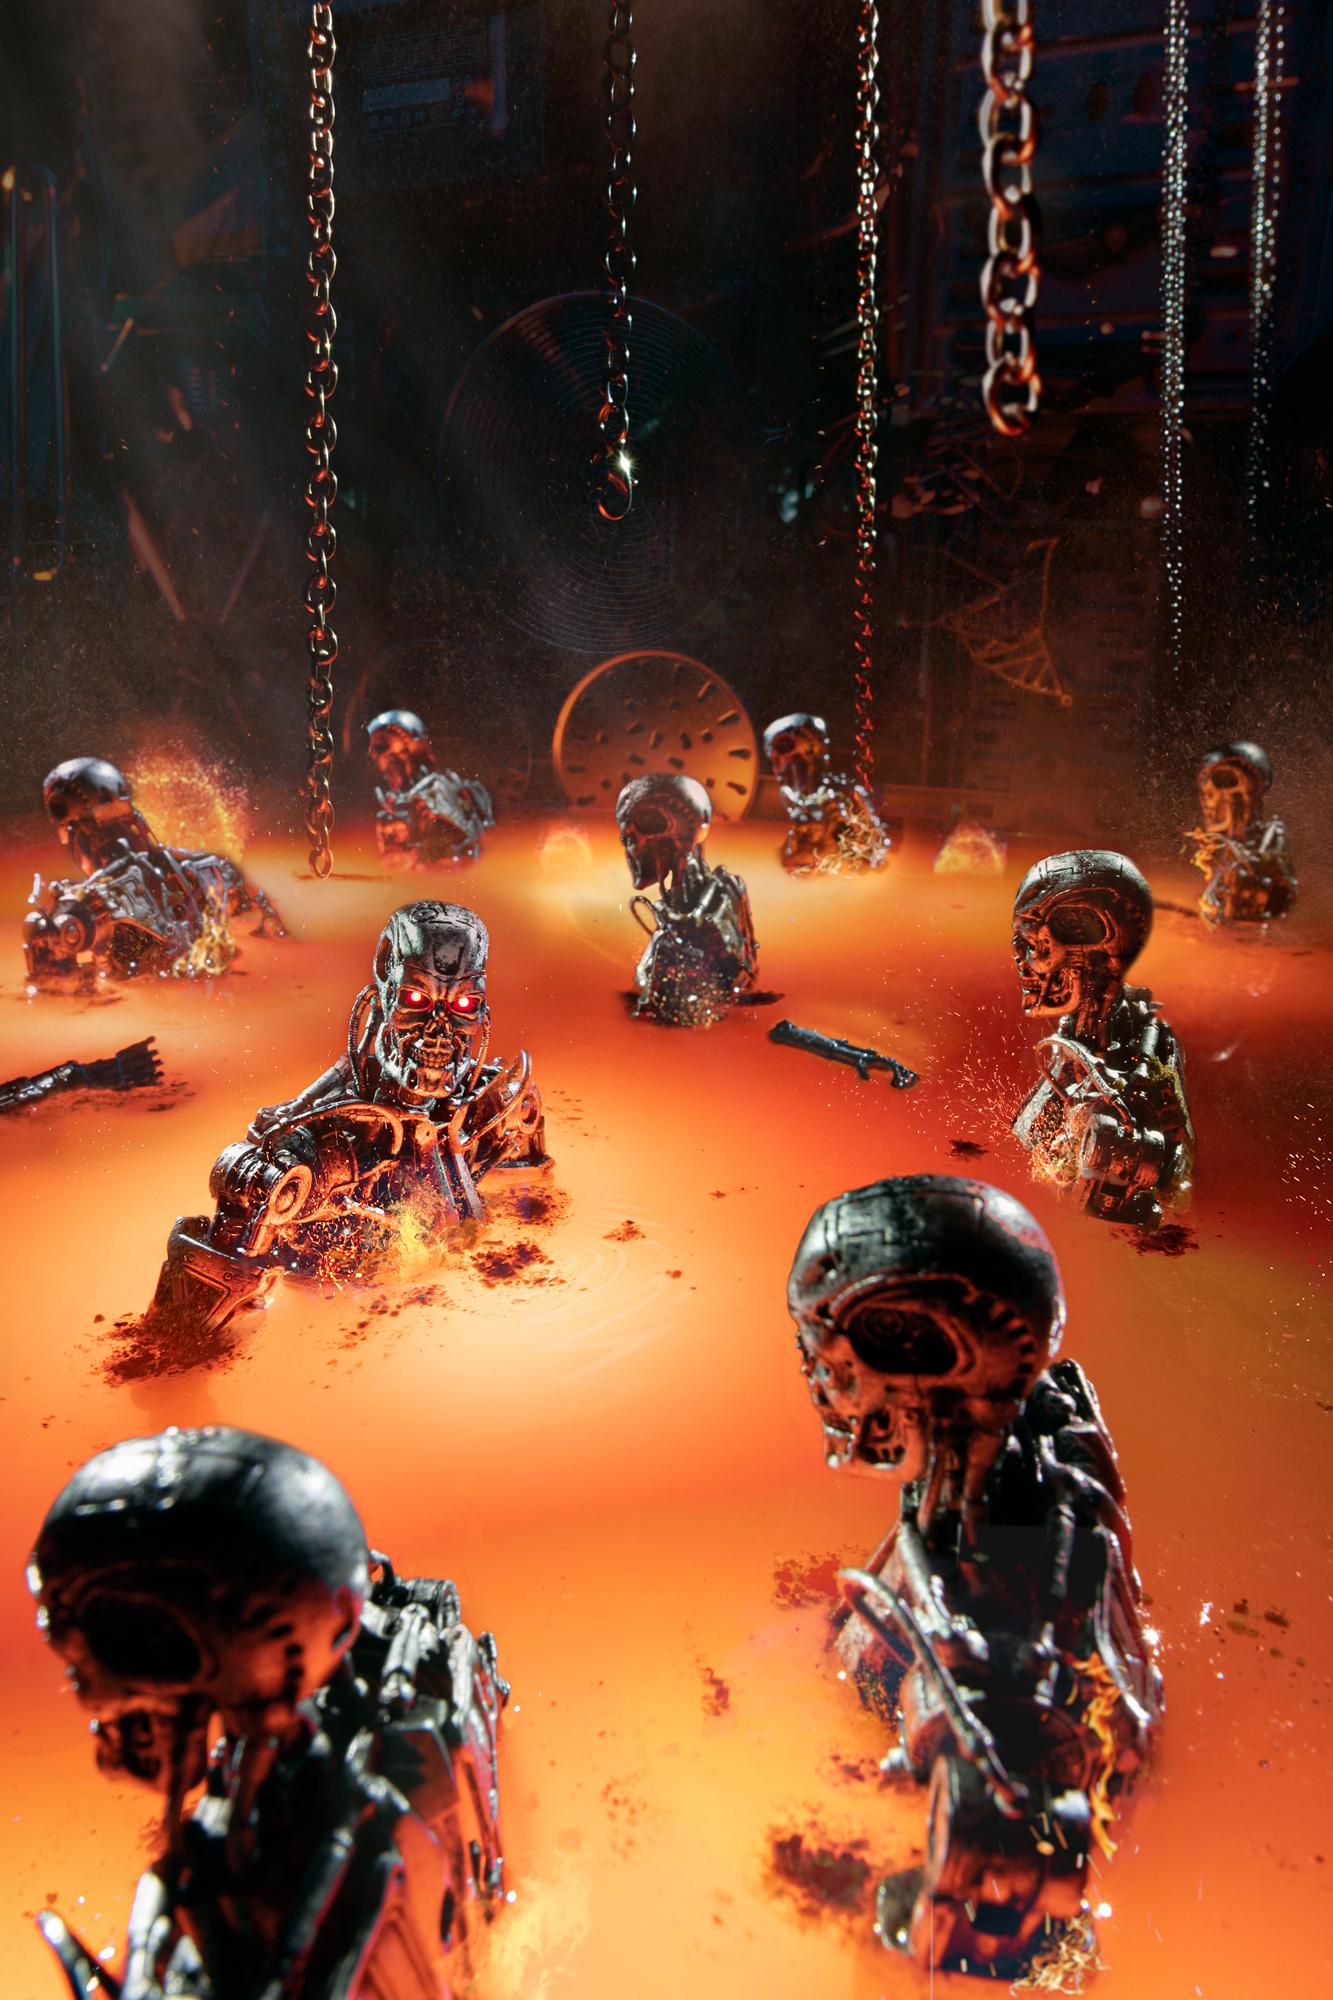 Terminator final scene-T800